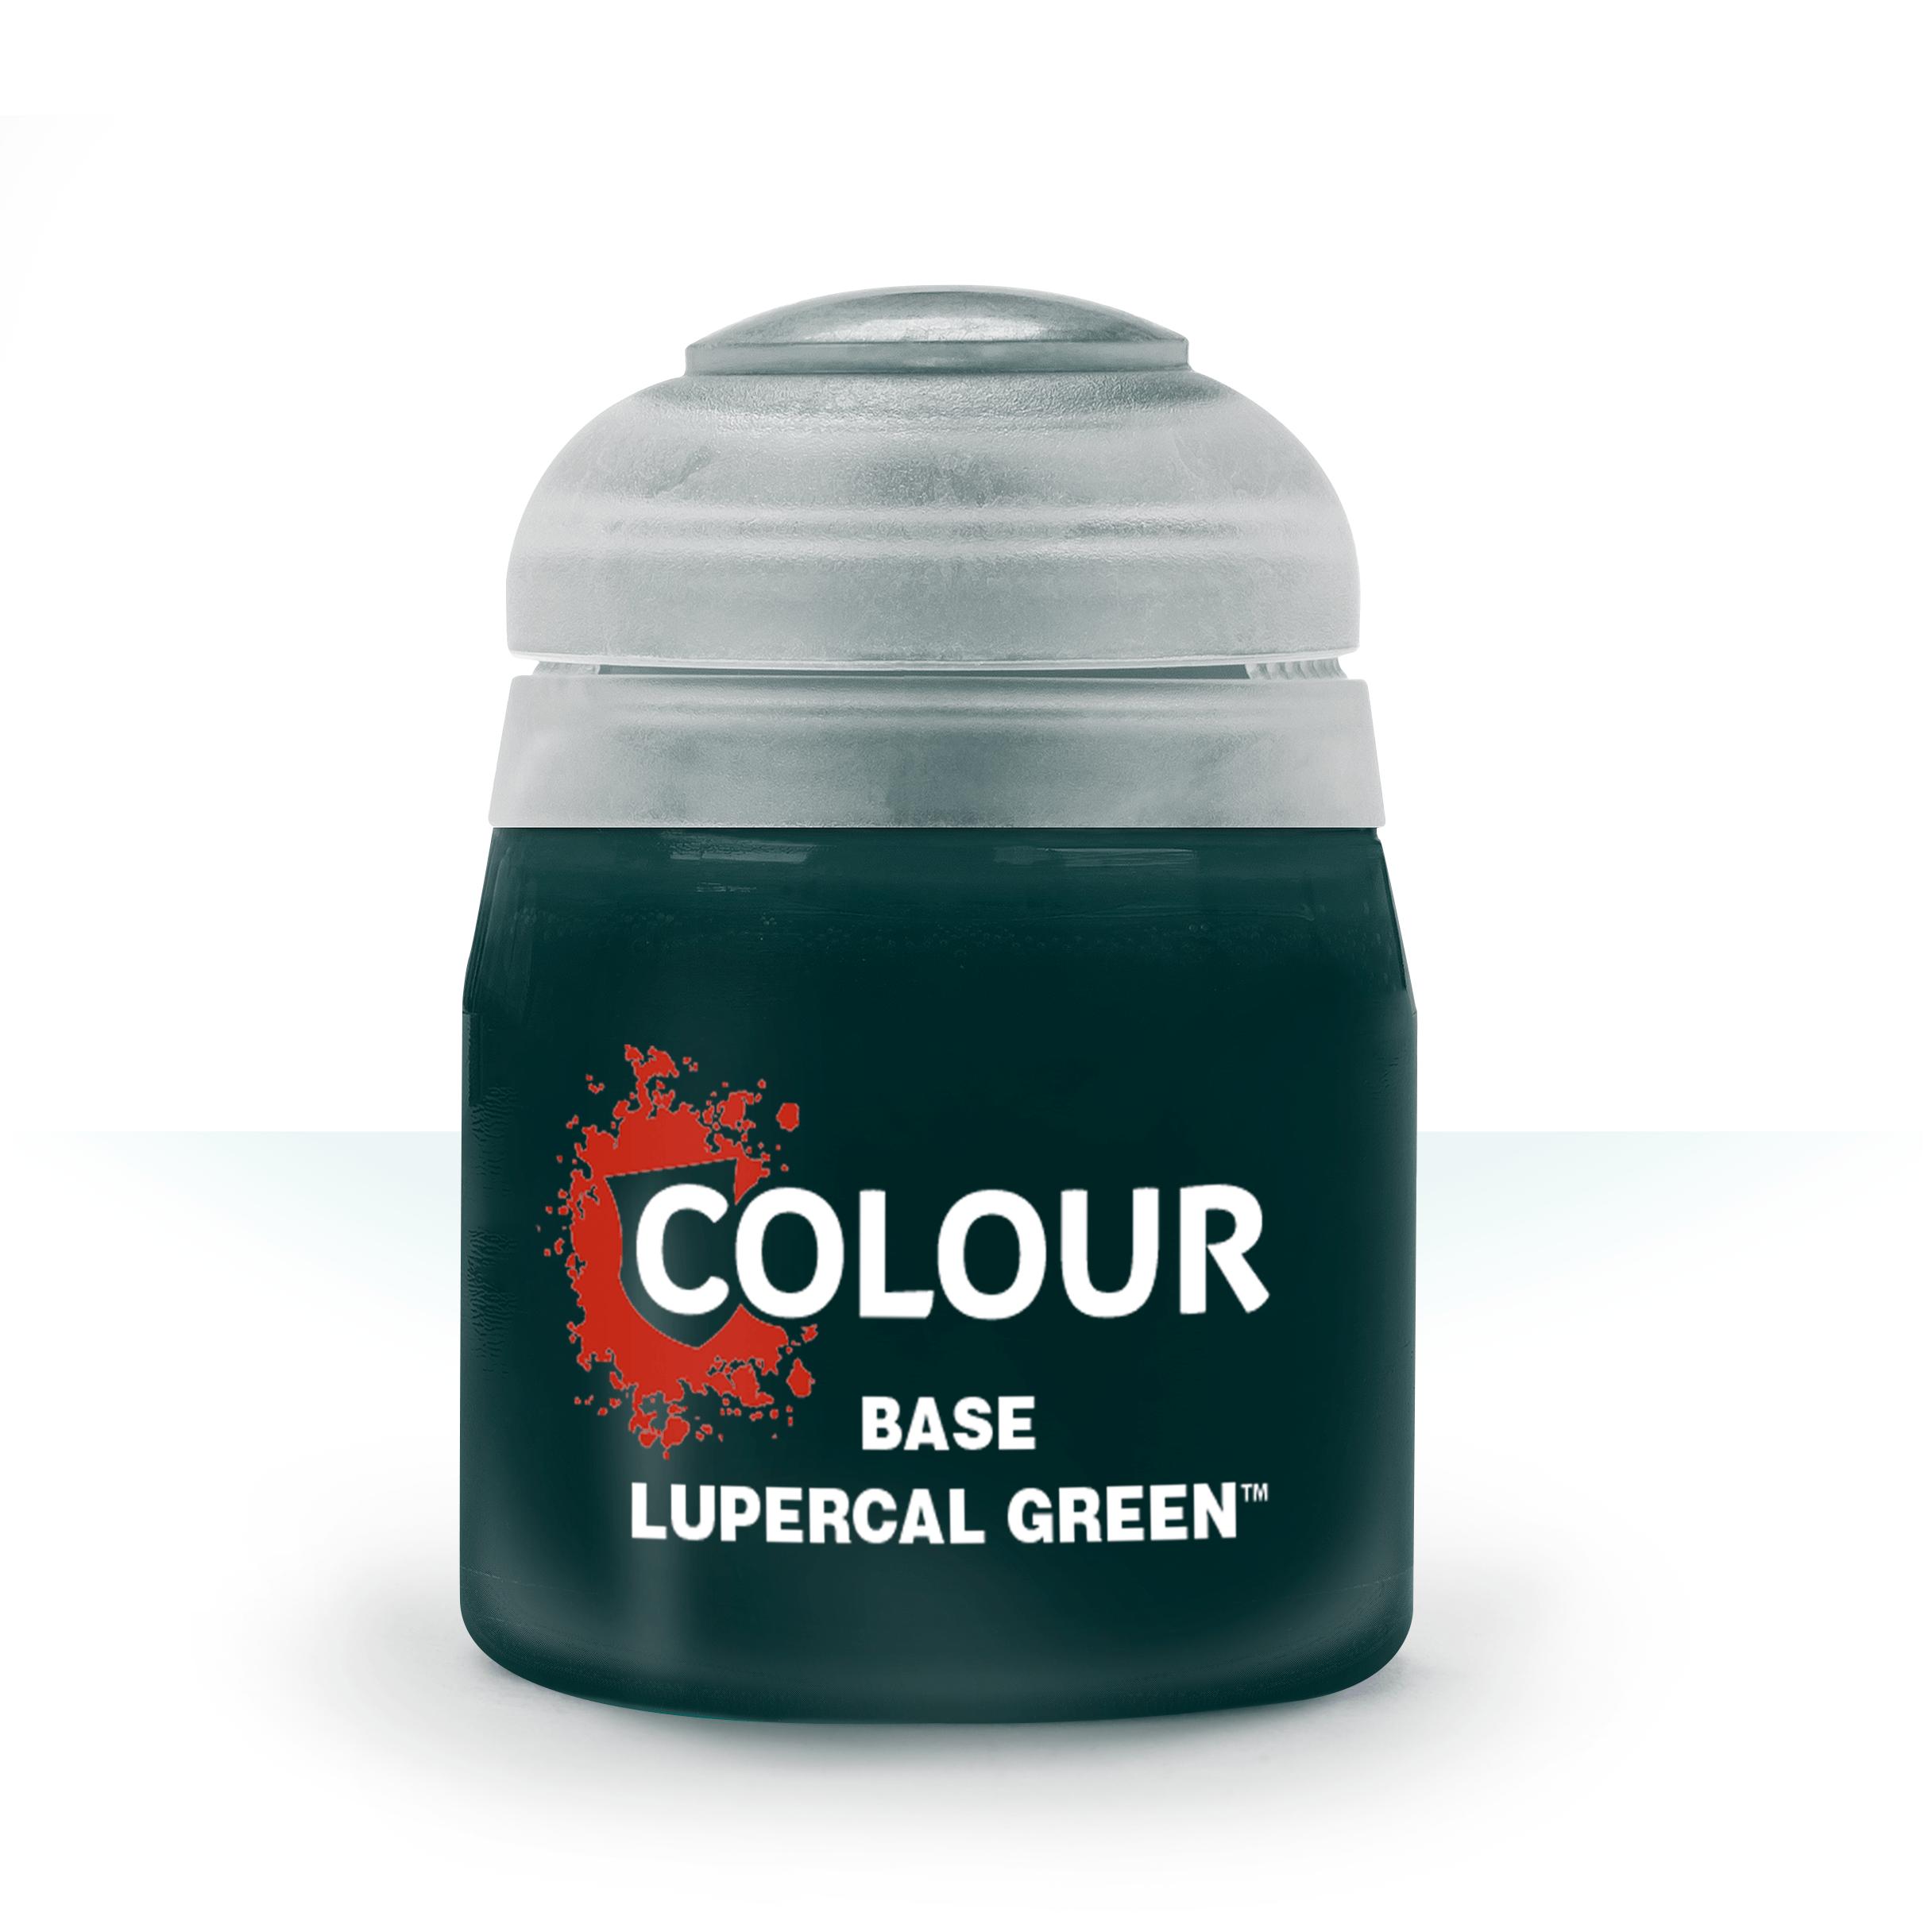 Lupercal Green, Citadel Base 12ml